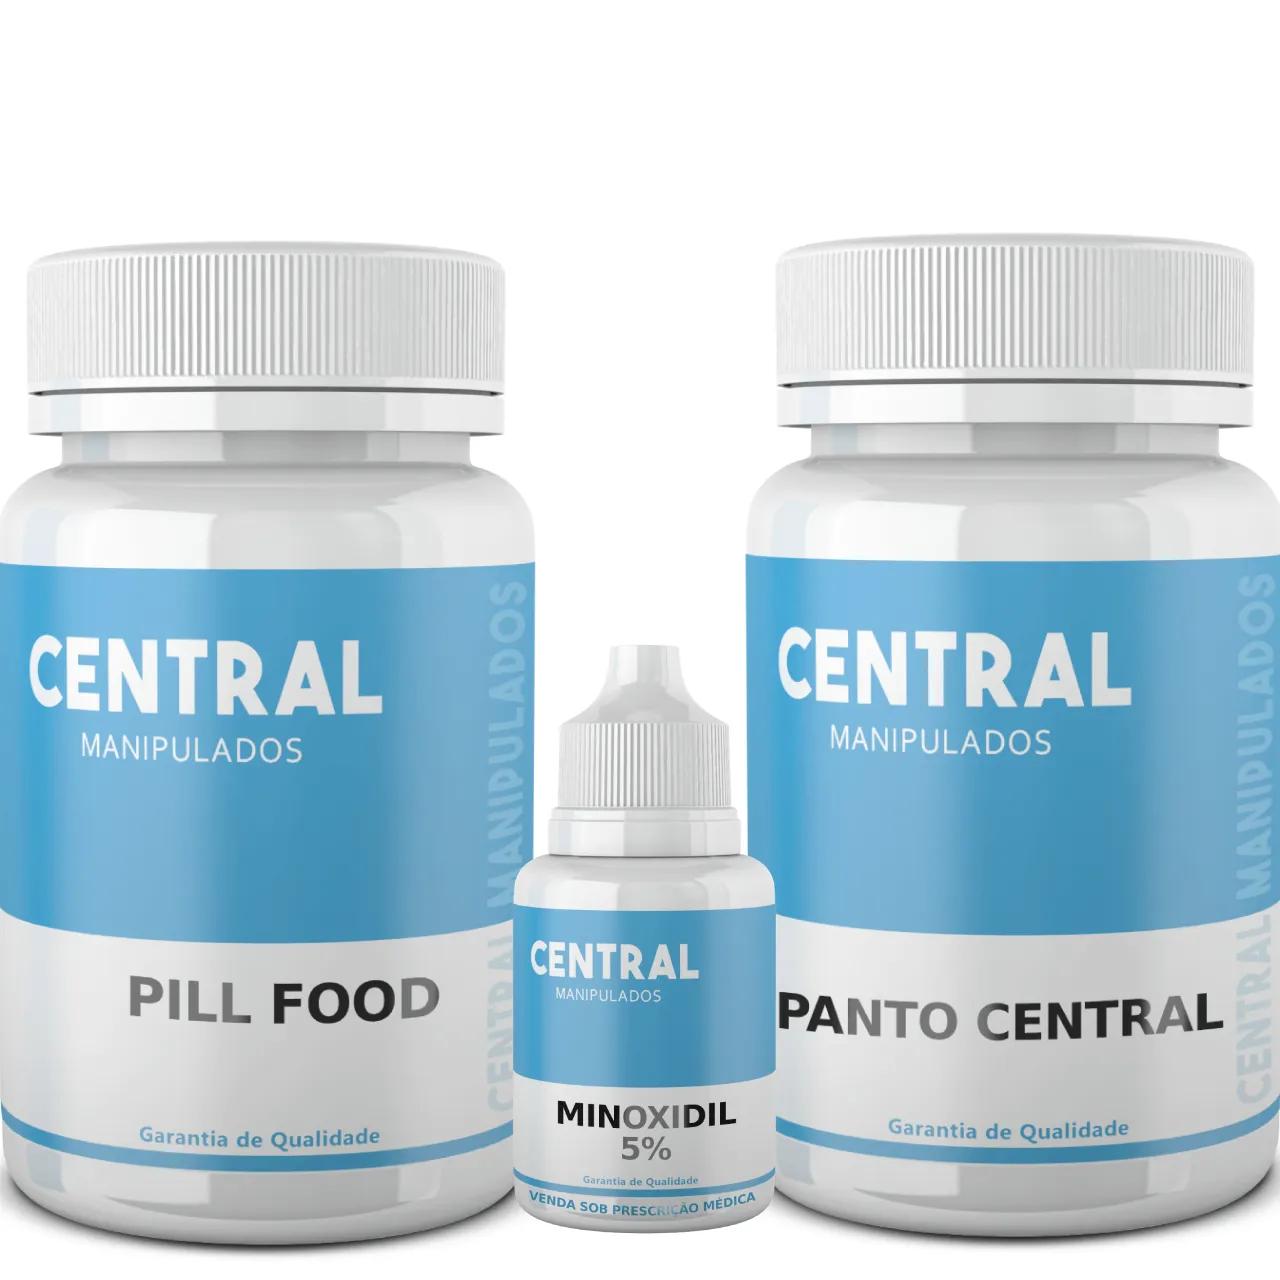 Pill Food 60 cápsulas + Minoxidil 5% 100ml Solução + PantoCentral 60 cápsulas